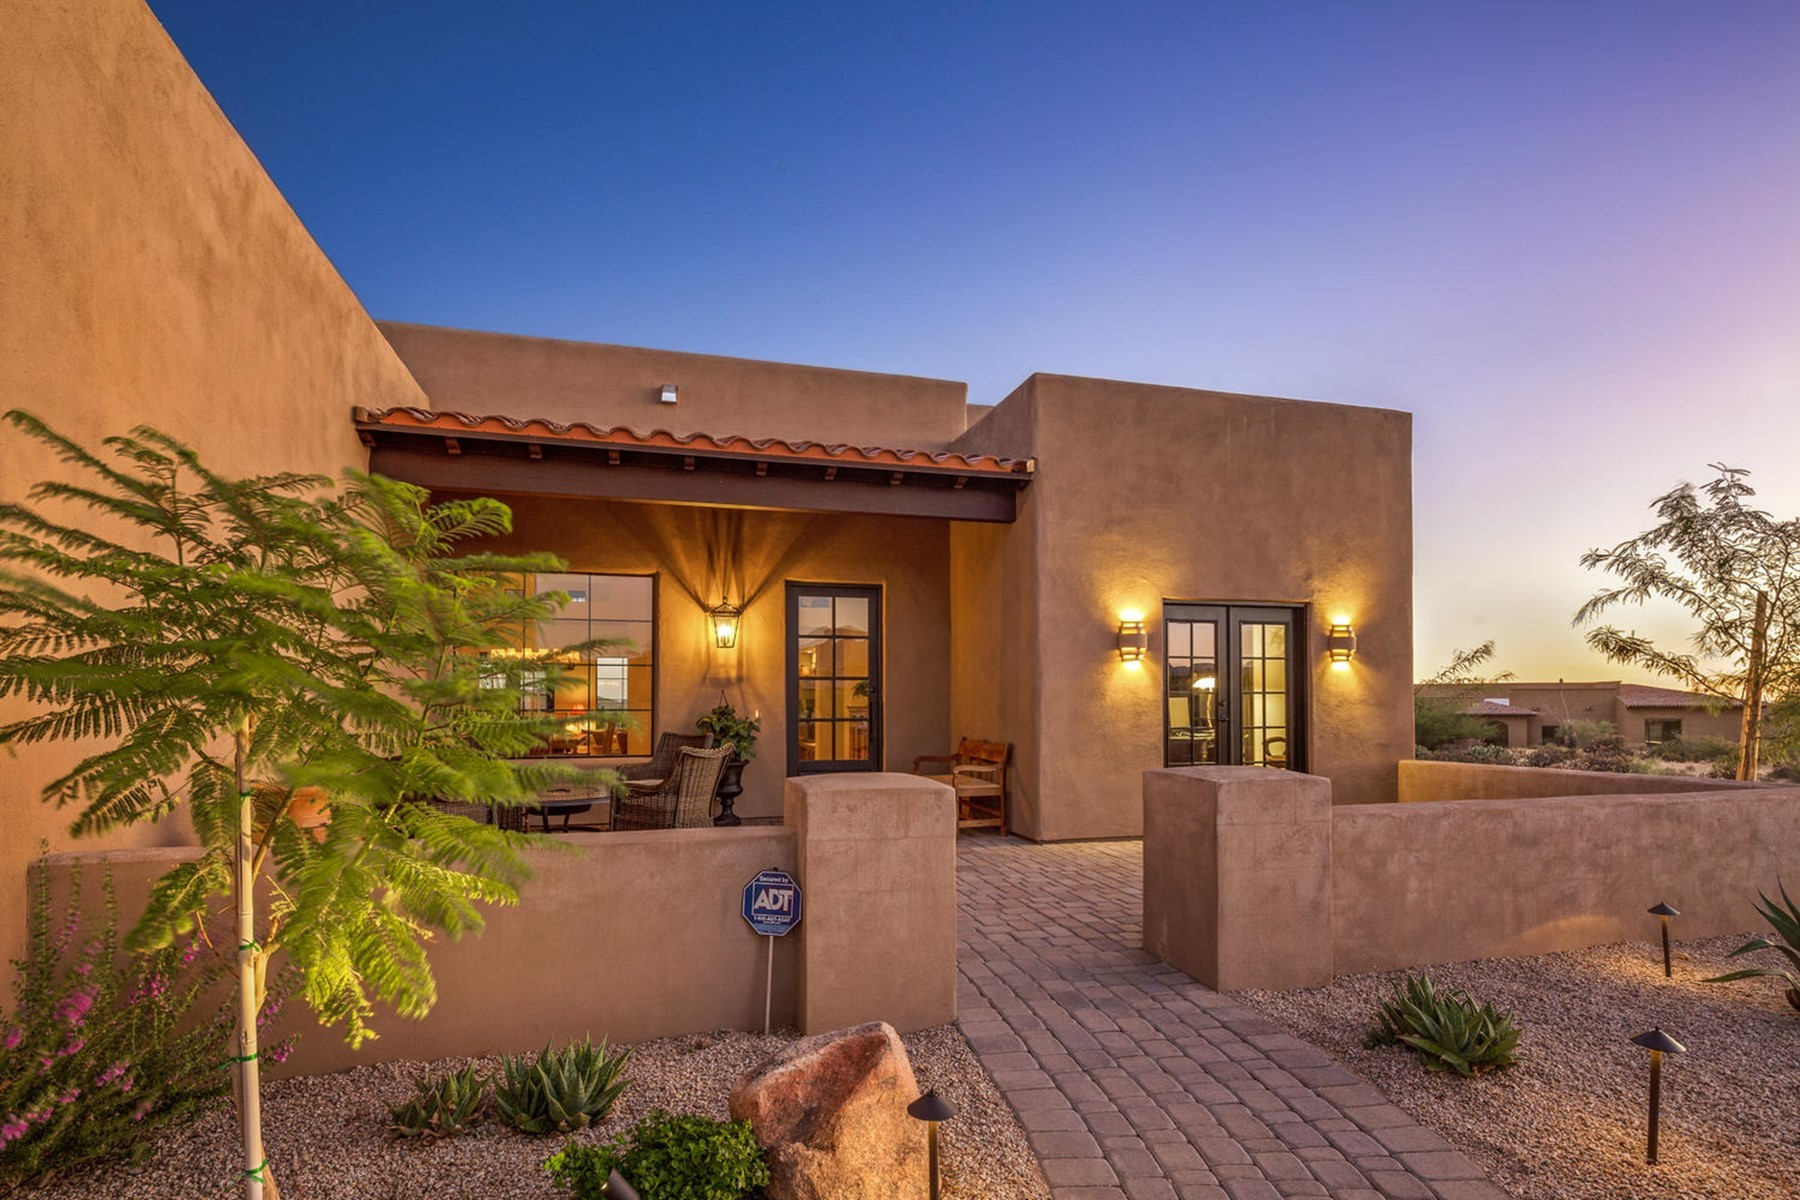 Single Family Homes for Sale at Beautiful Desert Territorial Home North Northview Lane Spokane, Washington 99208 United States